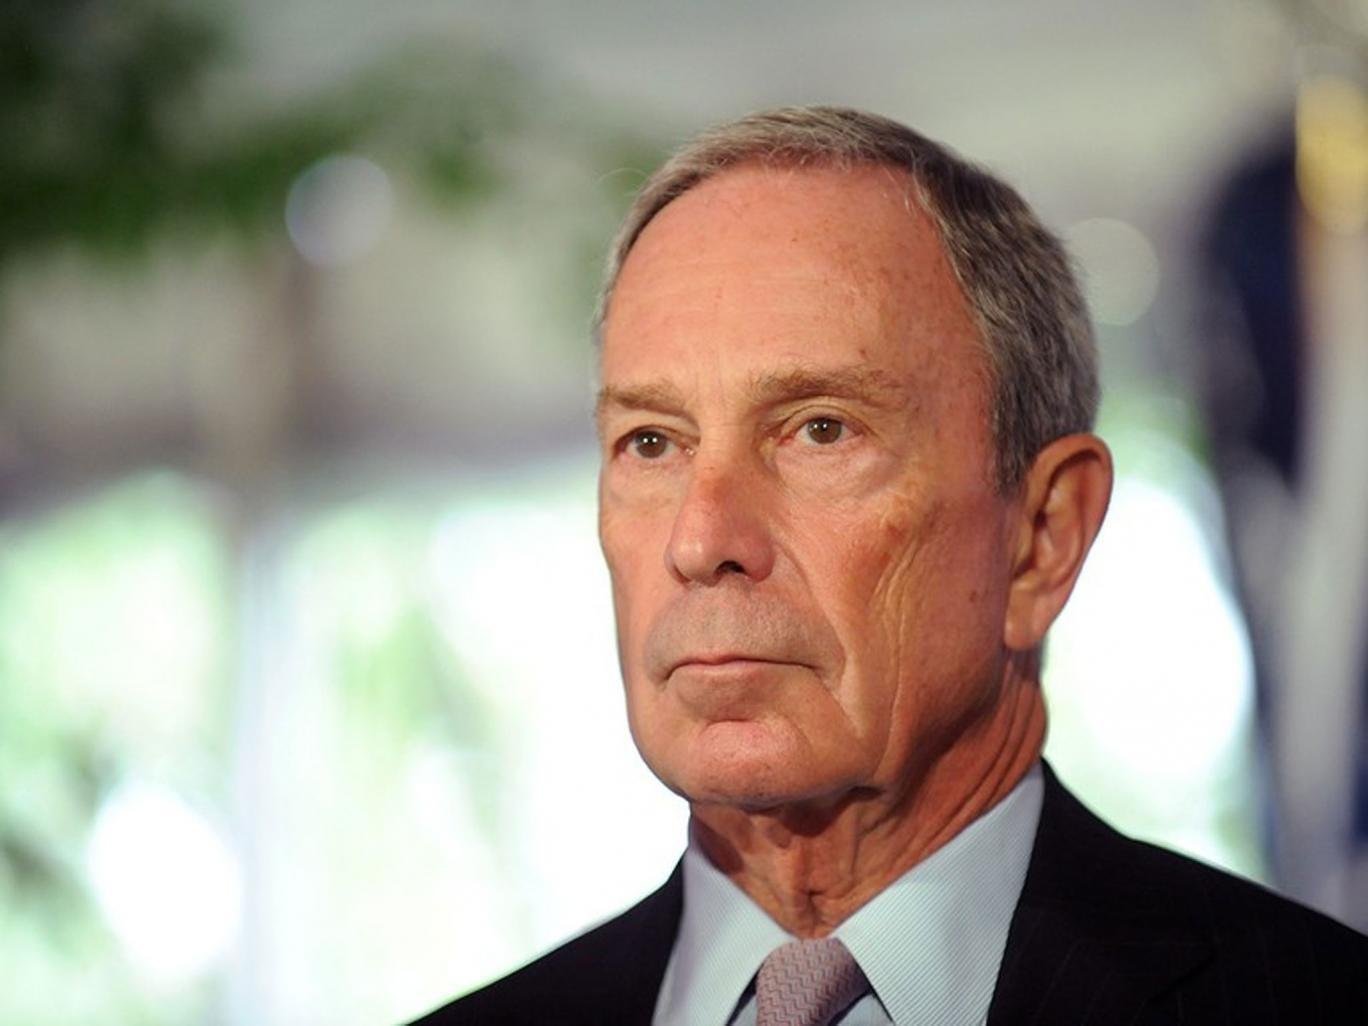 13. Michael Bloomberg: Net worth: $27 billion; Country: U.S; Source: Bloomberg LP